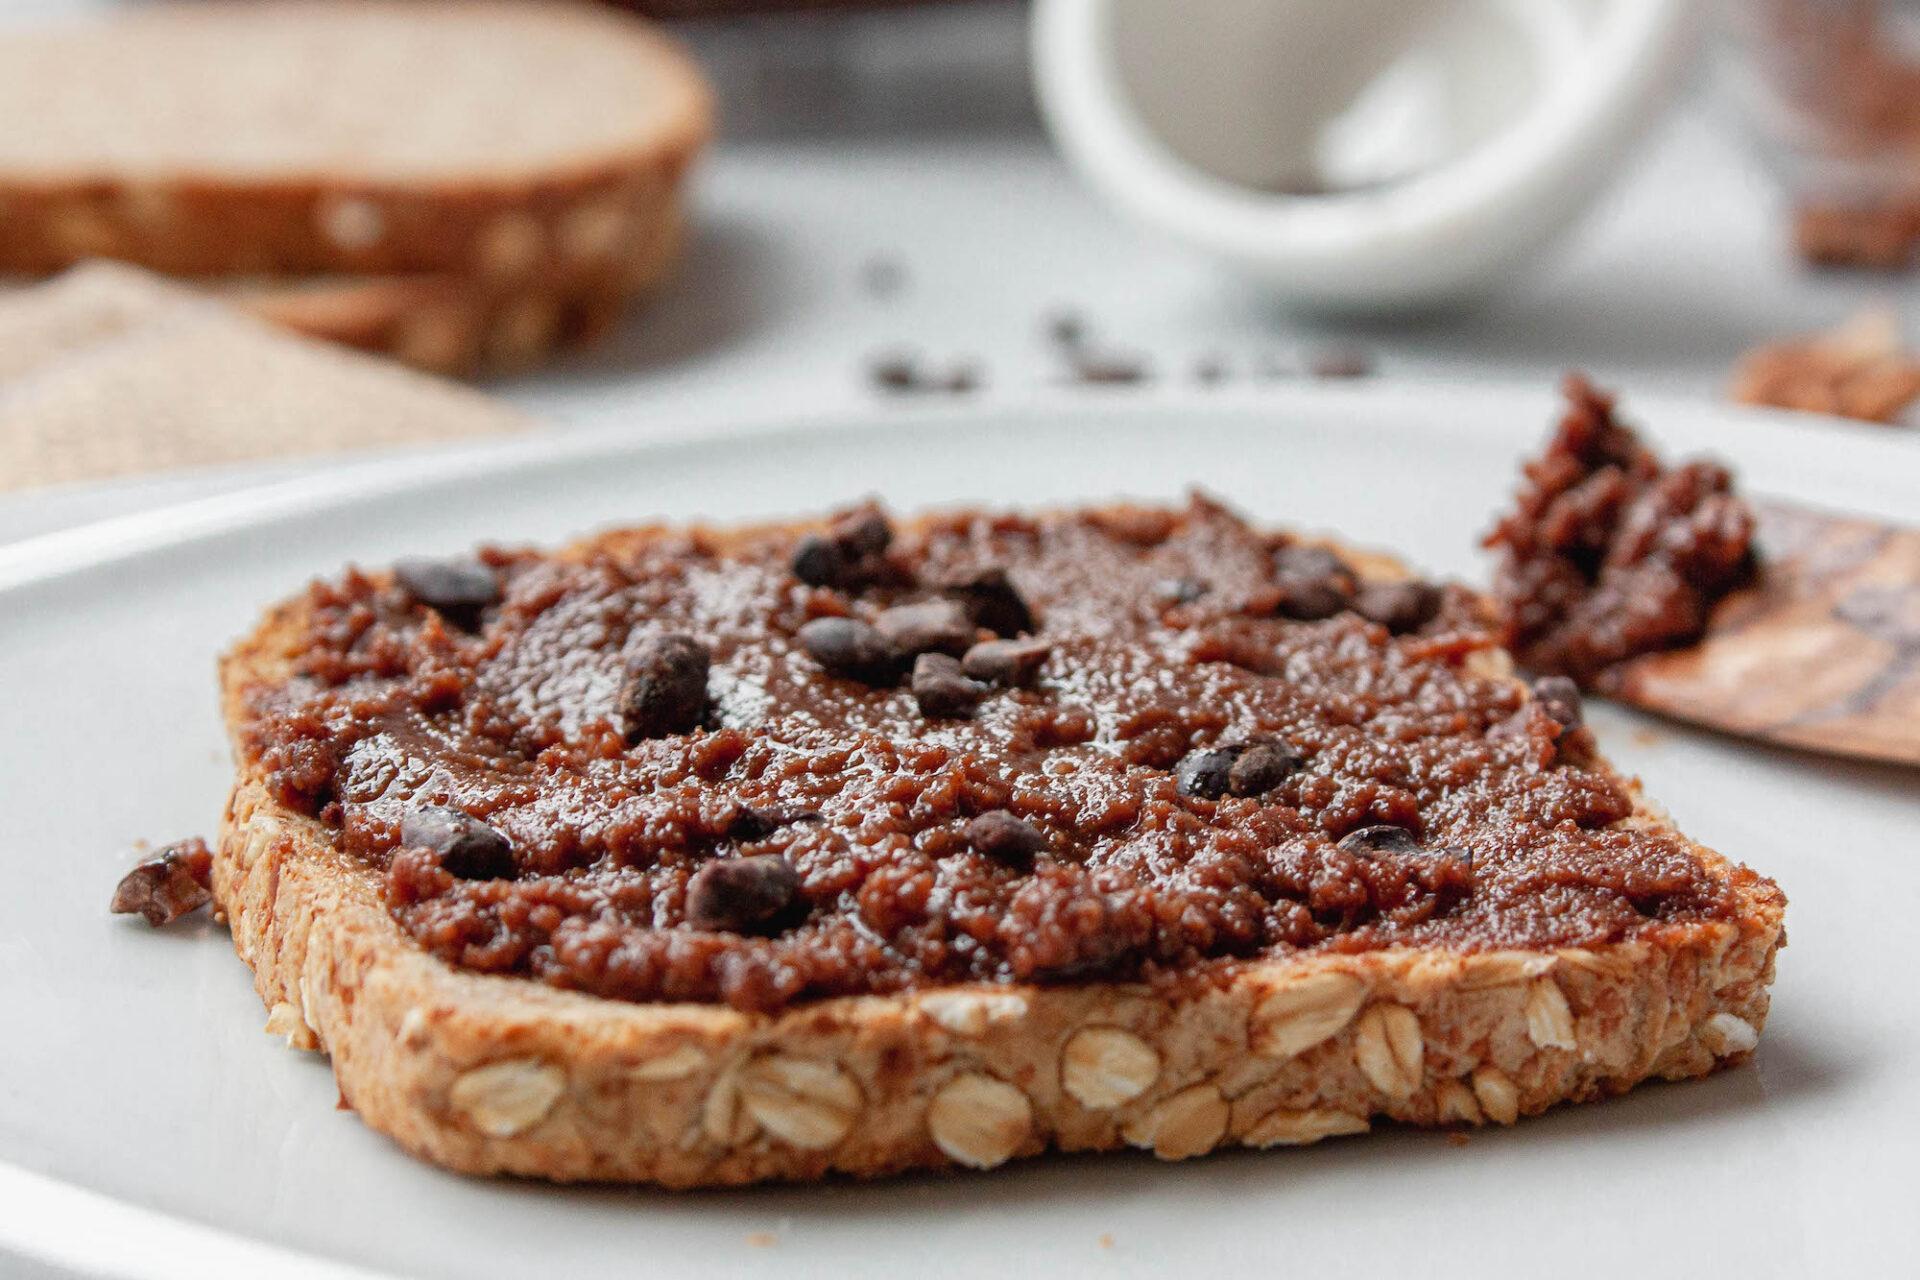 chocolate pecan butter spread on toast   flexatarian recipe